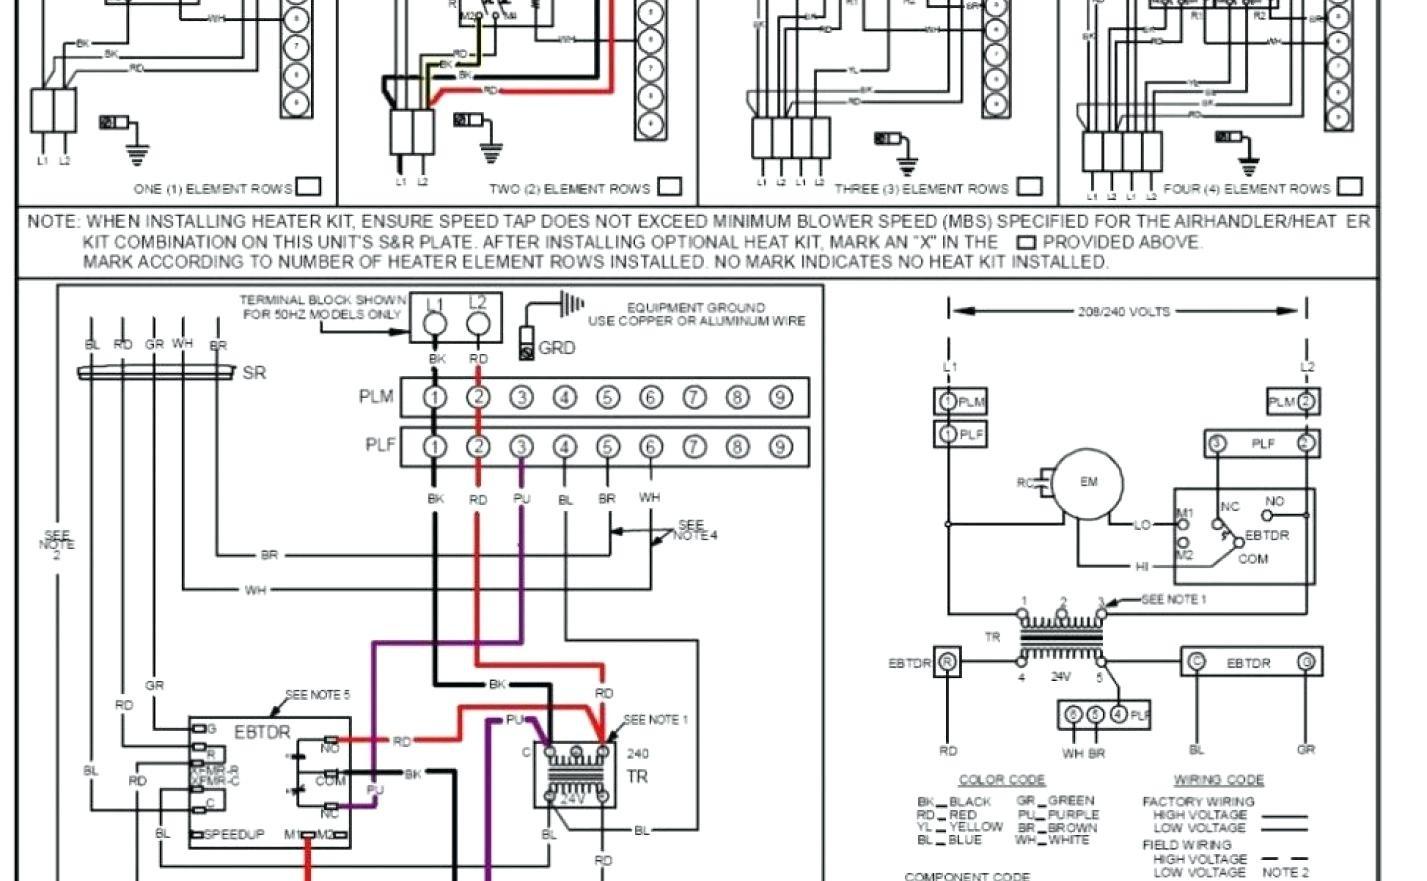 Mitsubishi Air Source Heat Pump Wiring Diagram